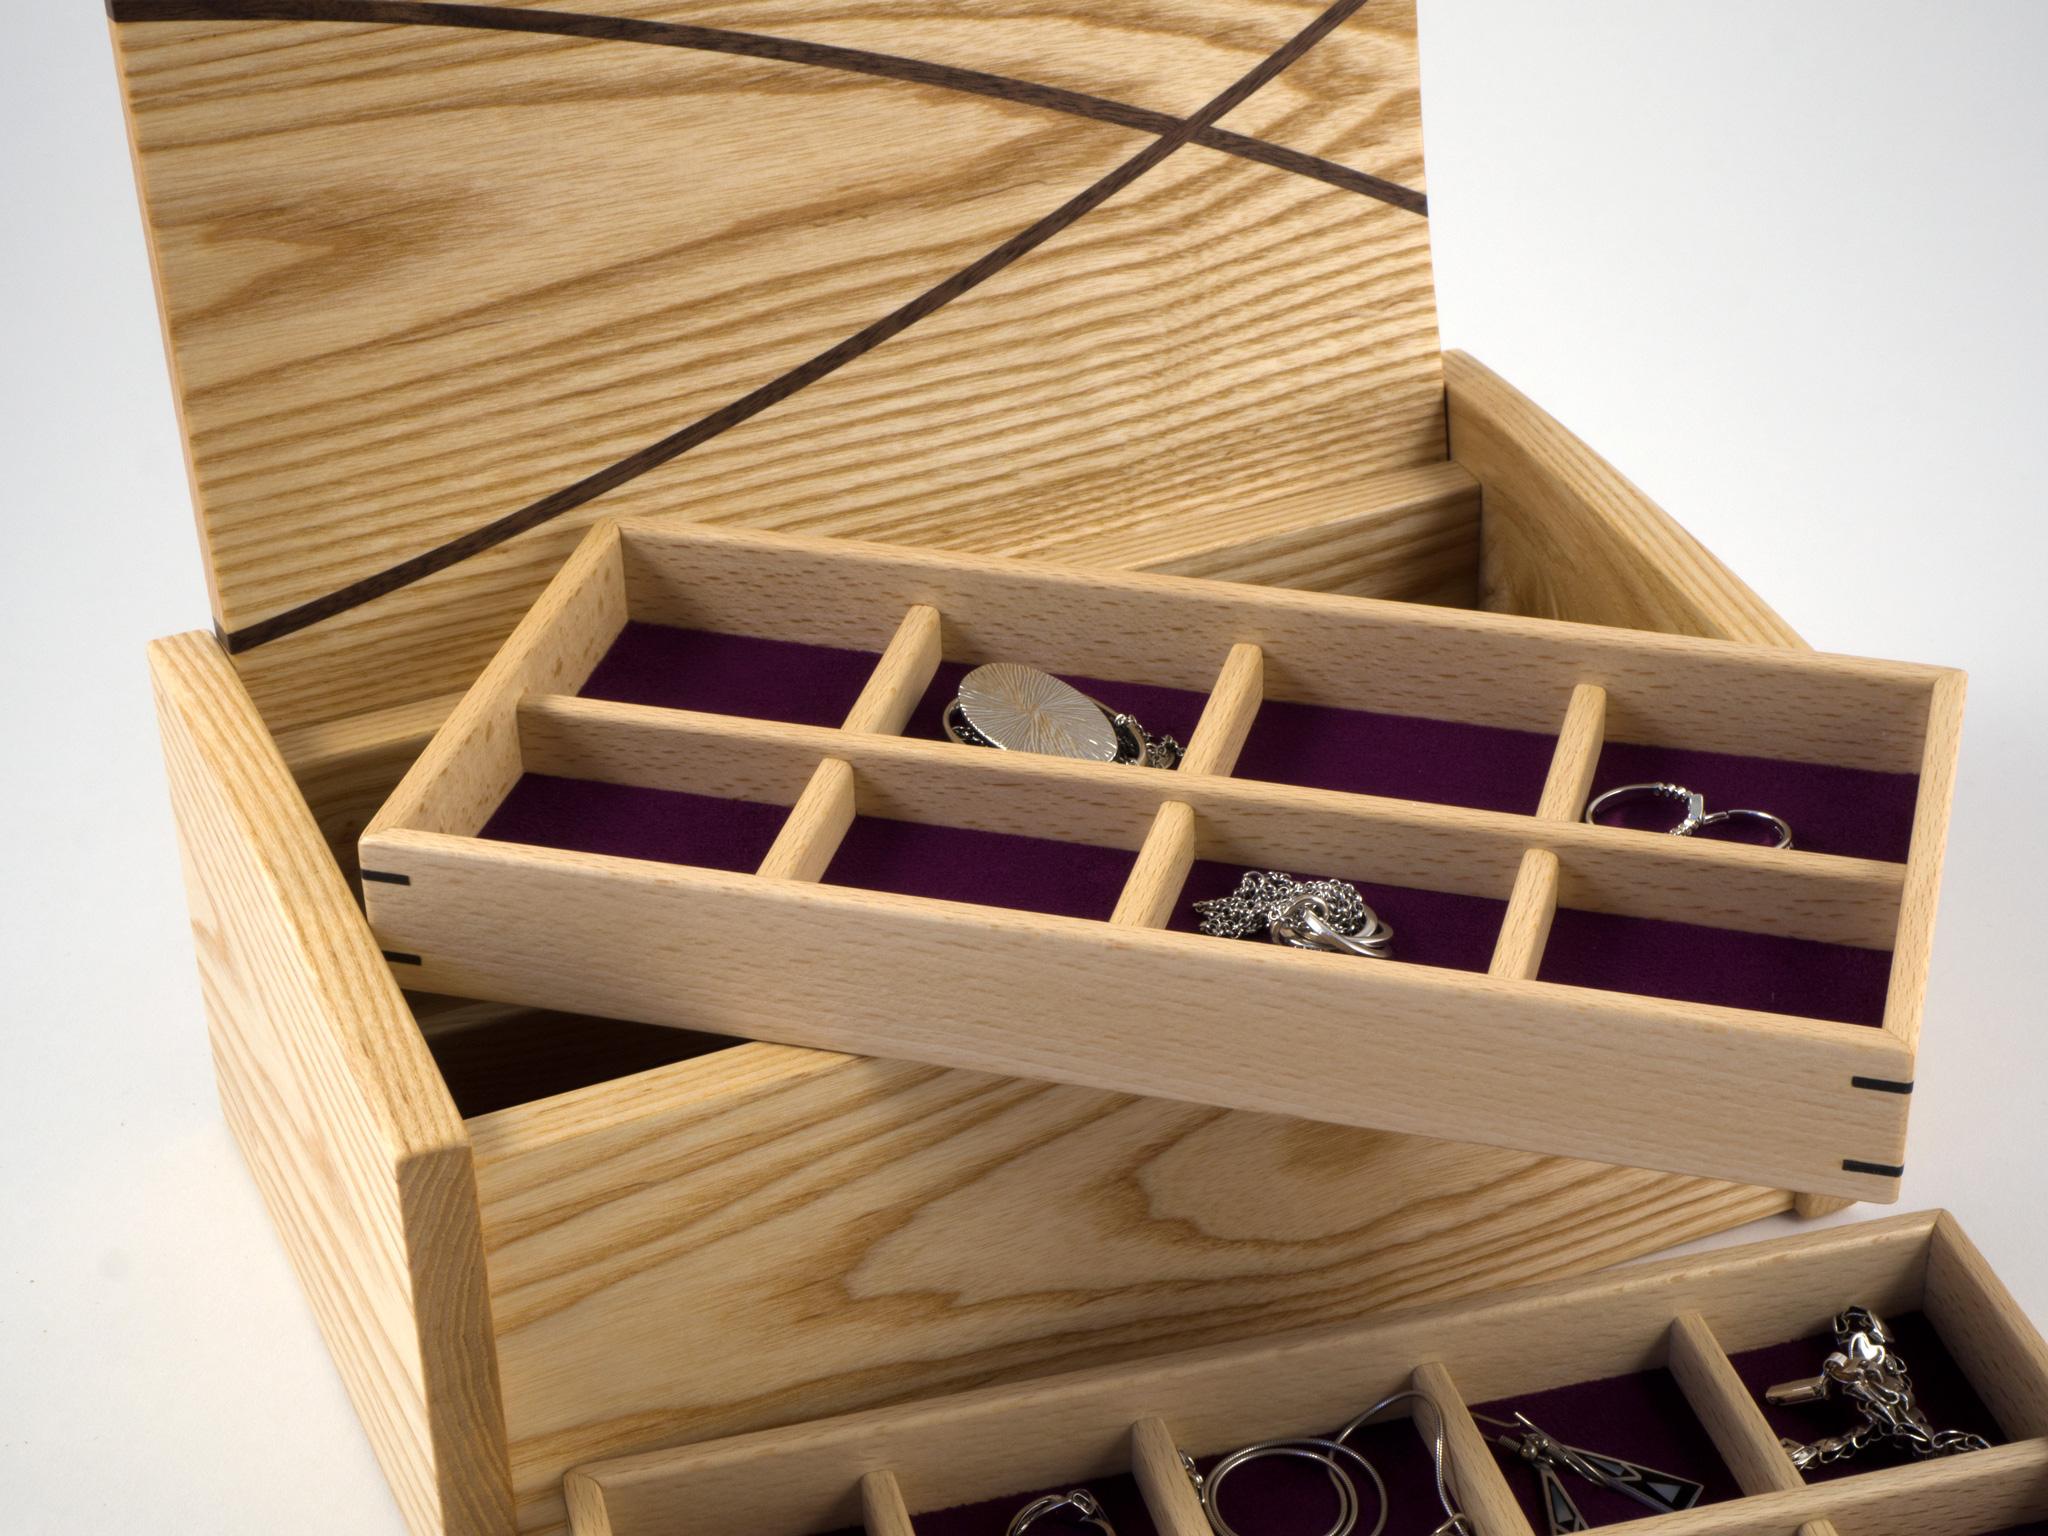 Ash jewellery box